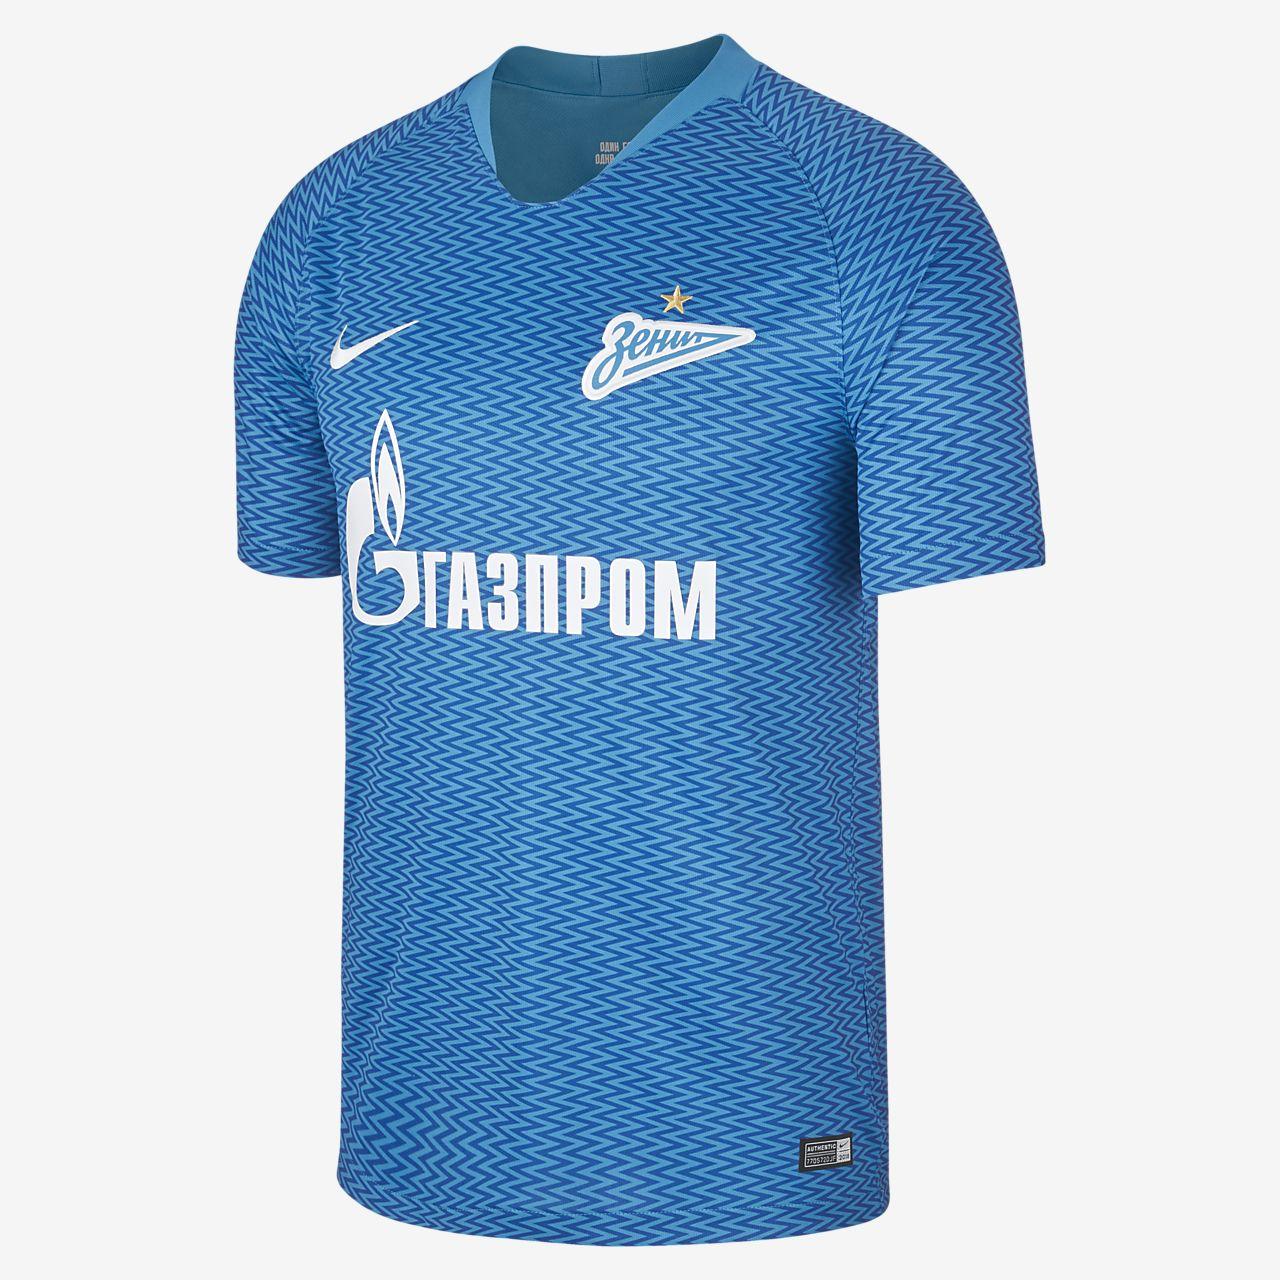 2018/19 FC Zenit Stadium Home férfi futballmez